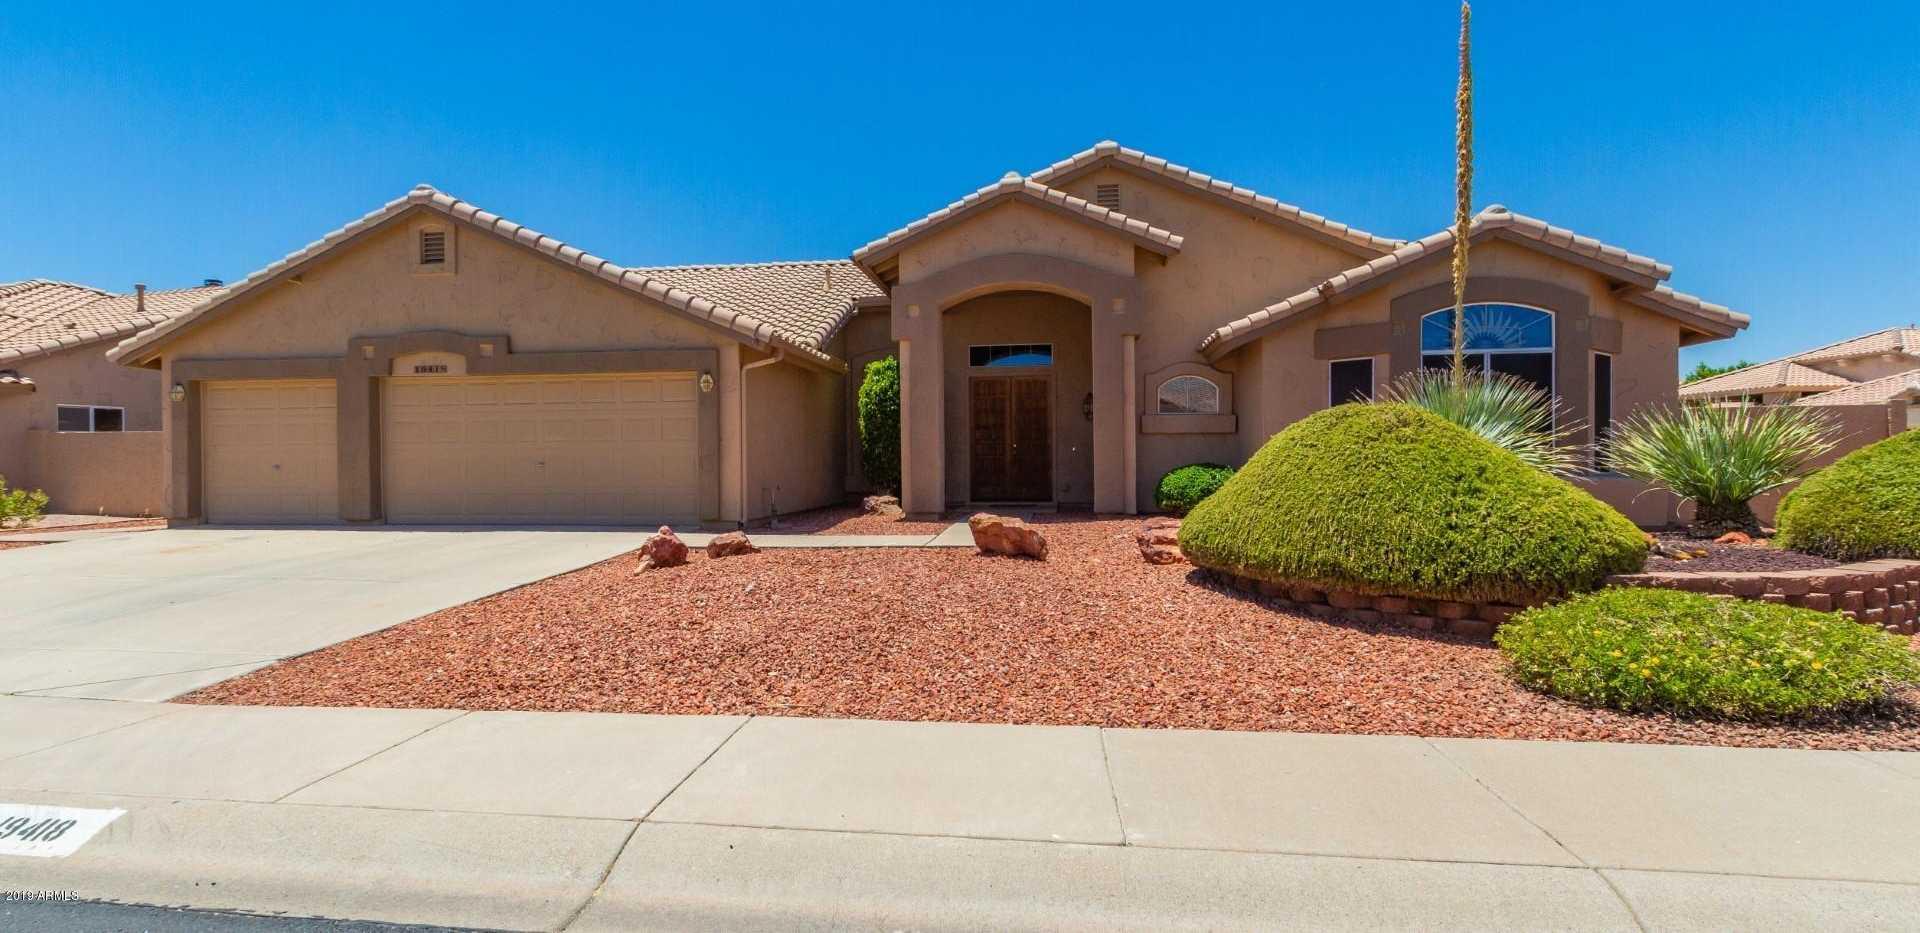 Homes for Sale in Westbrook Village - Team Clayton Real Estate